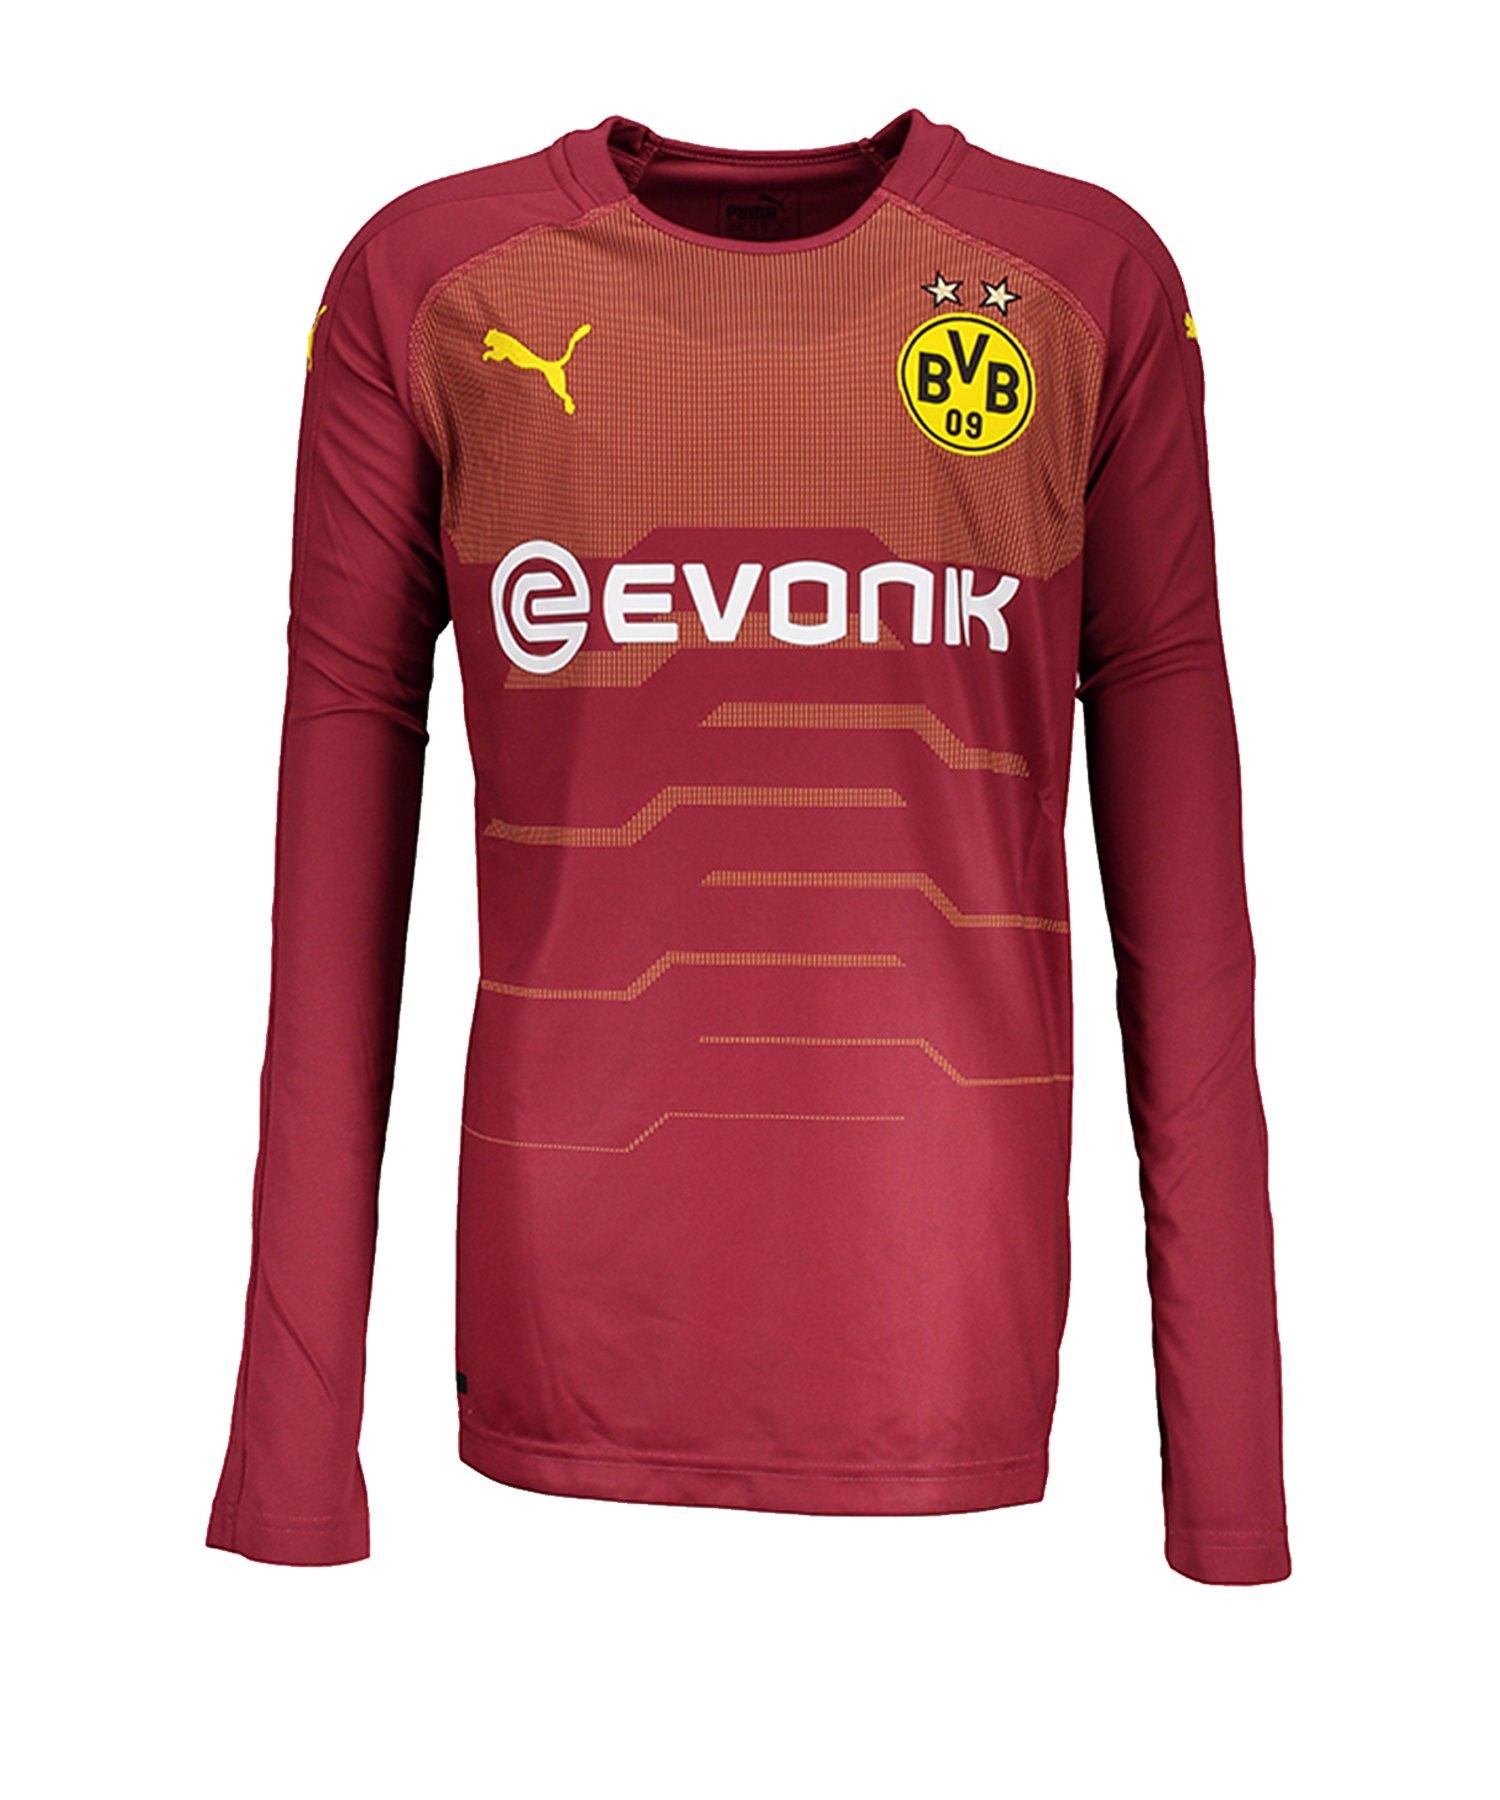 PUMA BVB Dortmund Torwarttrikot 2018/2019 Kids Rot F03 - rot